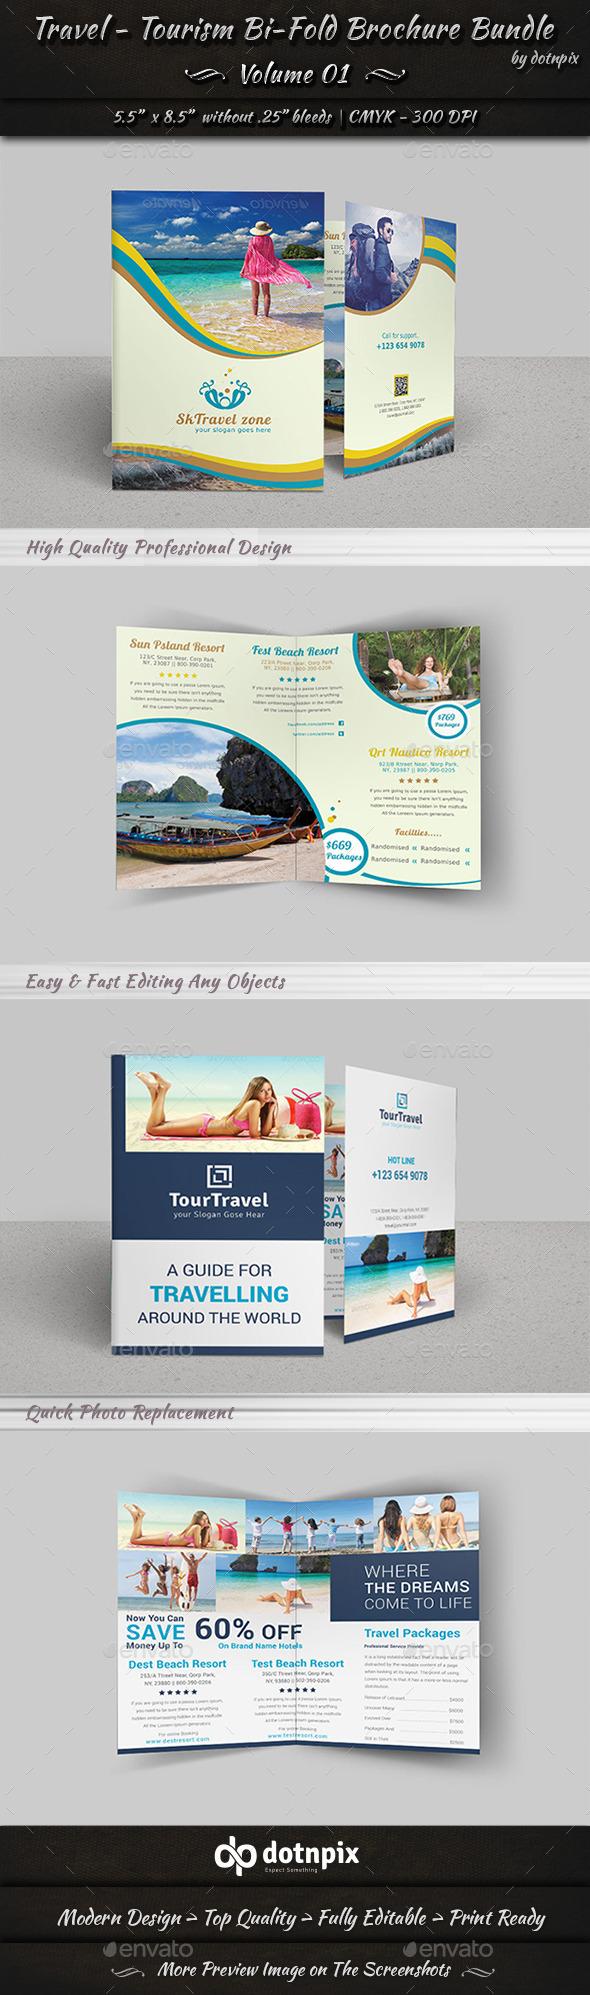 GraphicRiver Travel Tourism Bi-Fold Brochure Bundle v1 9208474